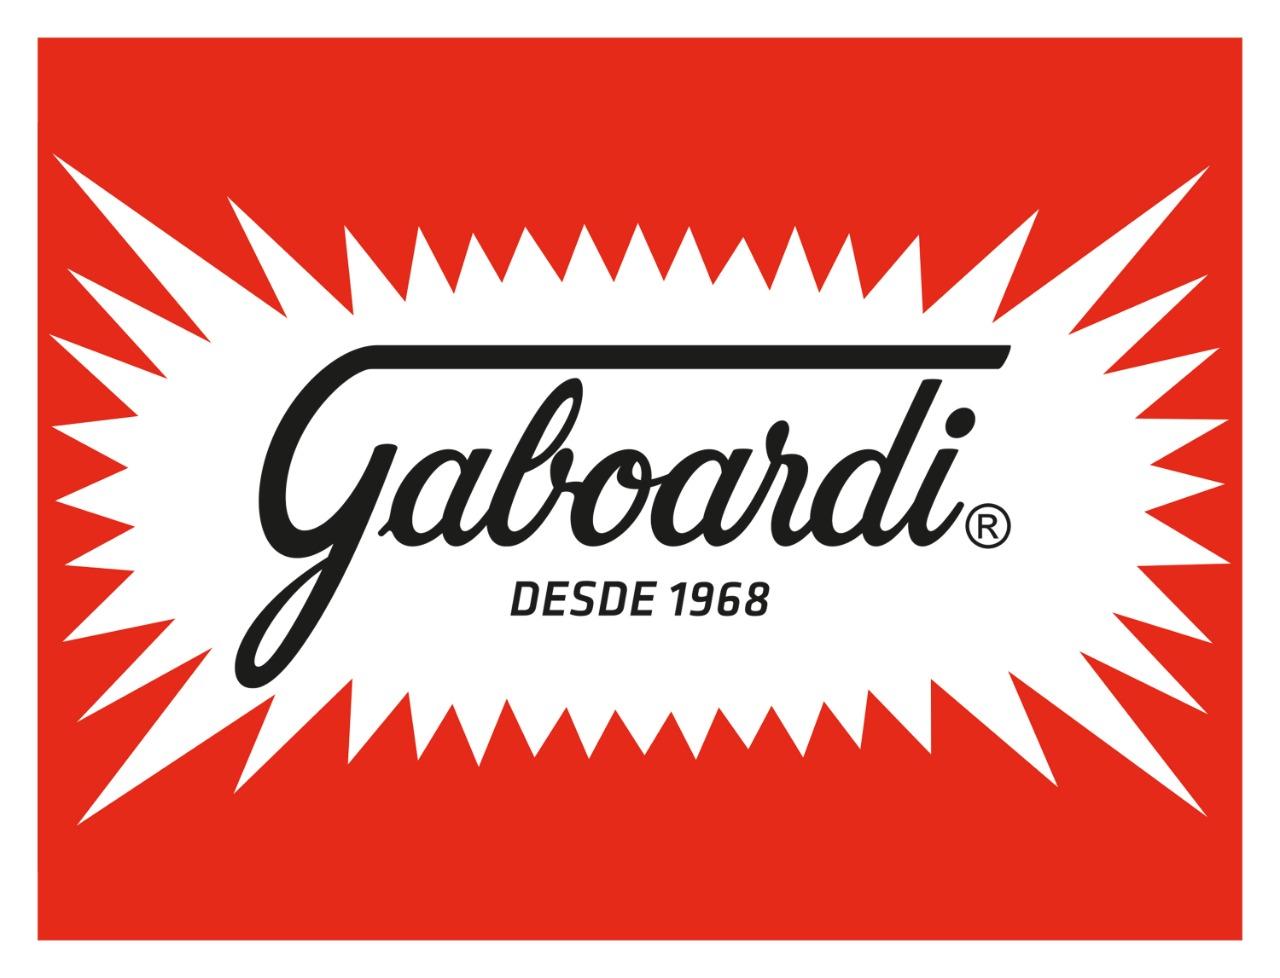 Trabalhe Gaboardi